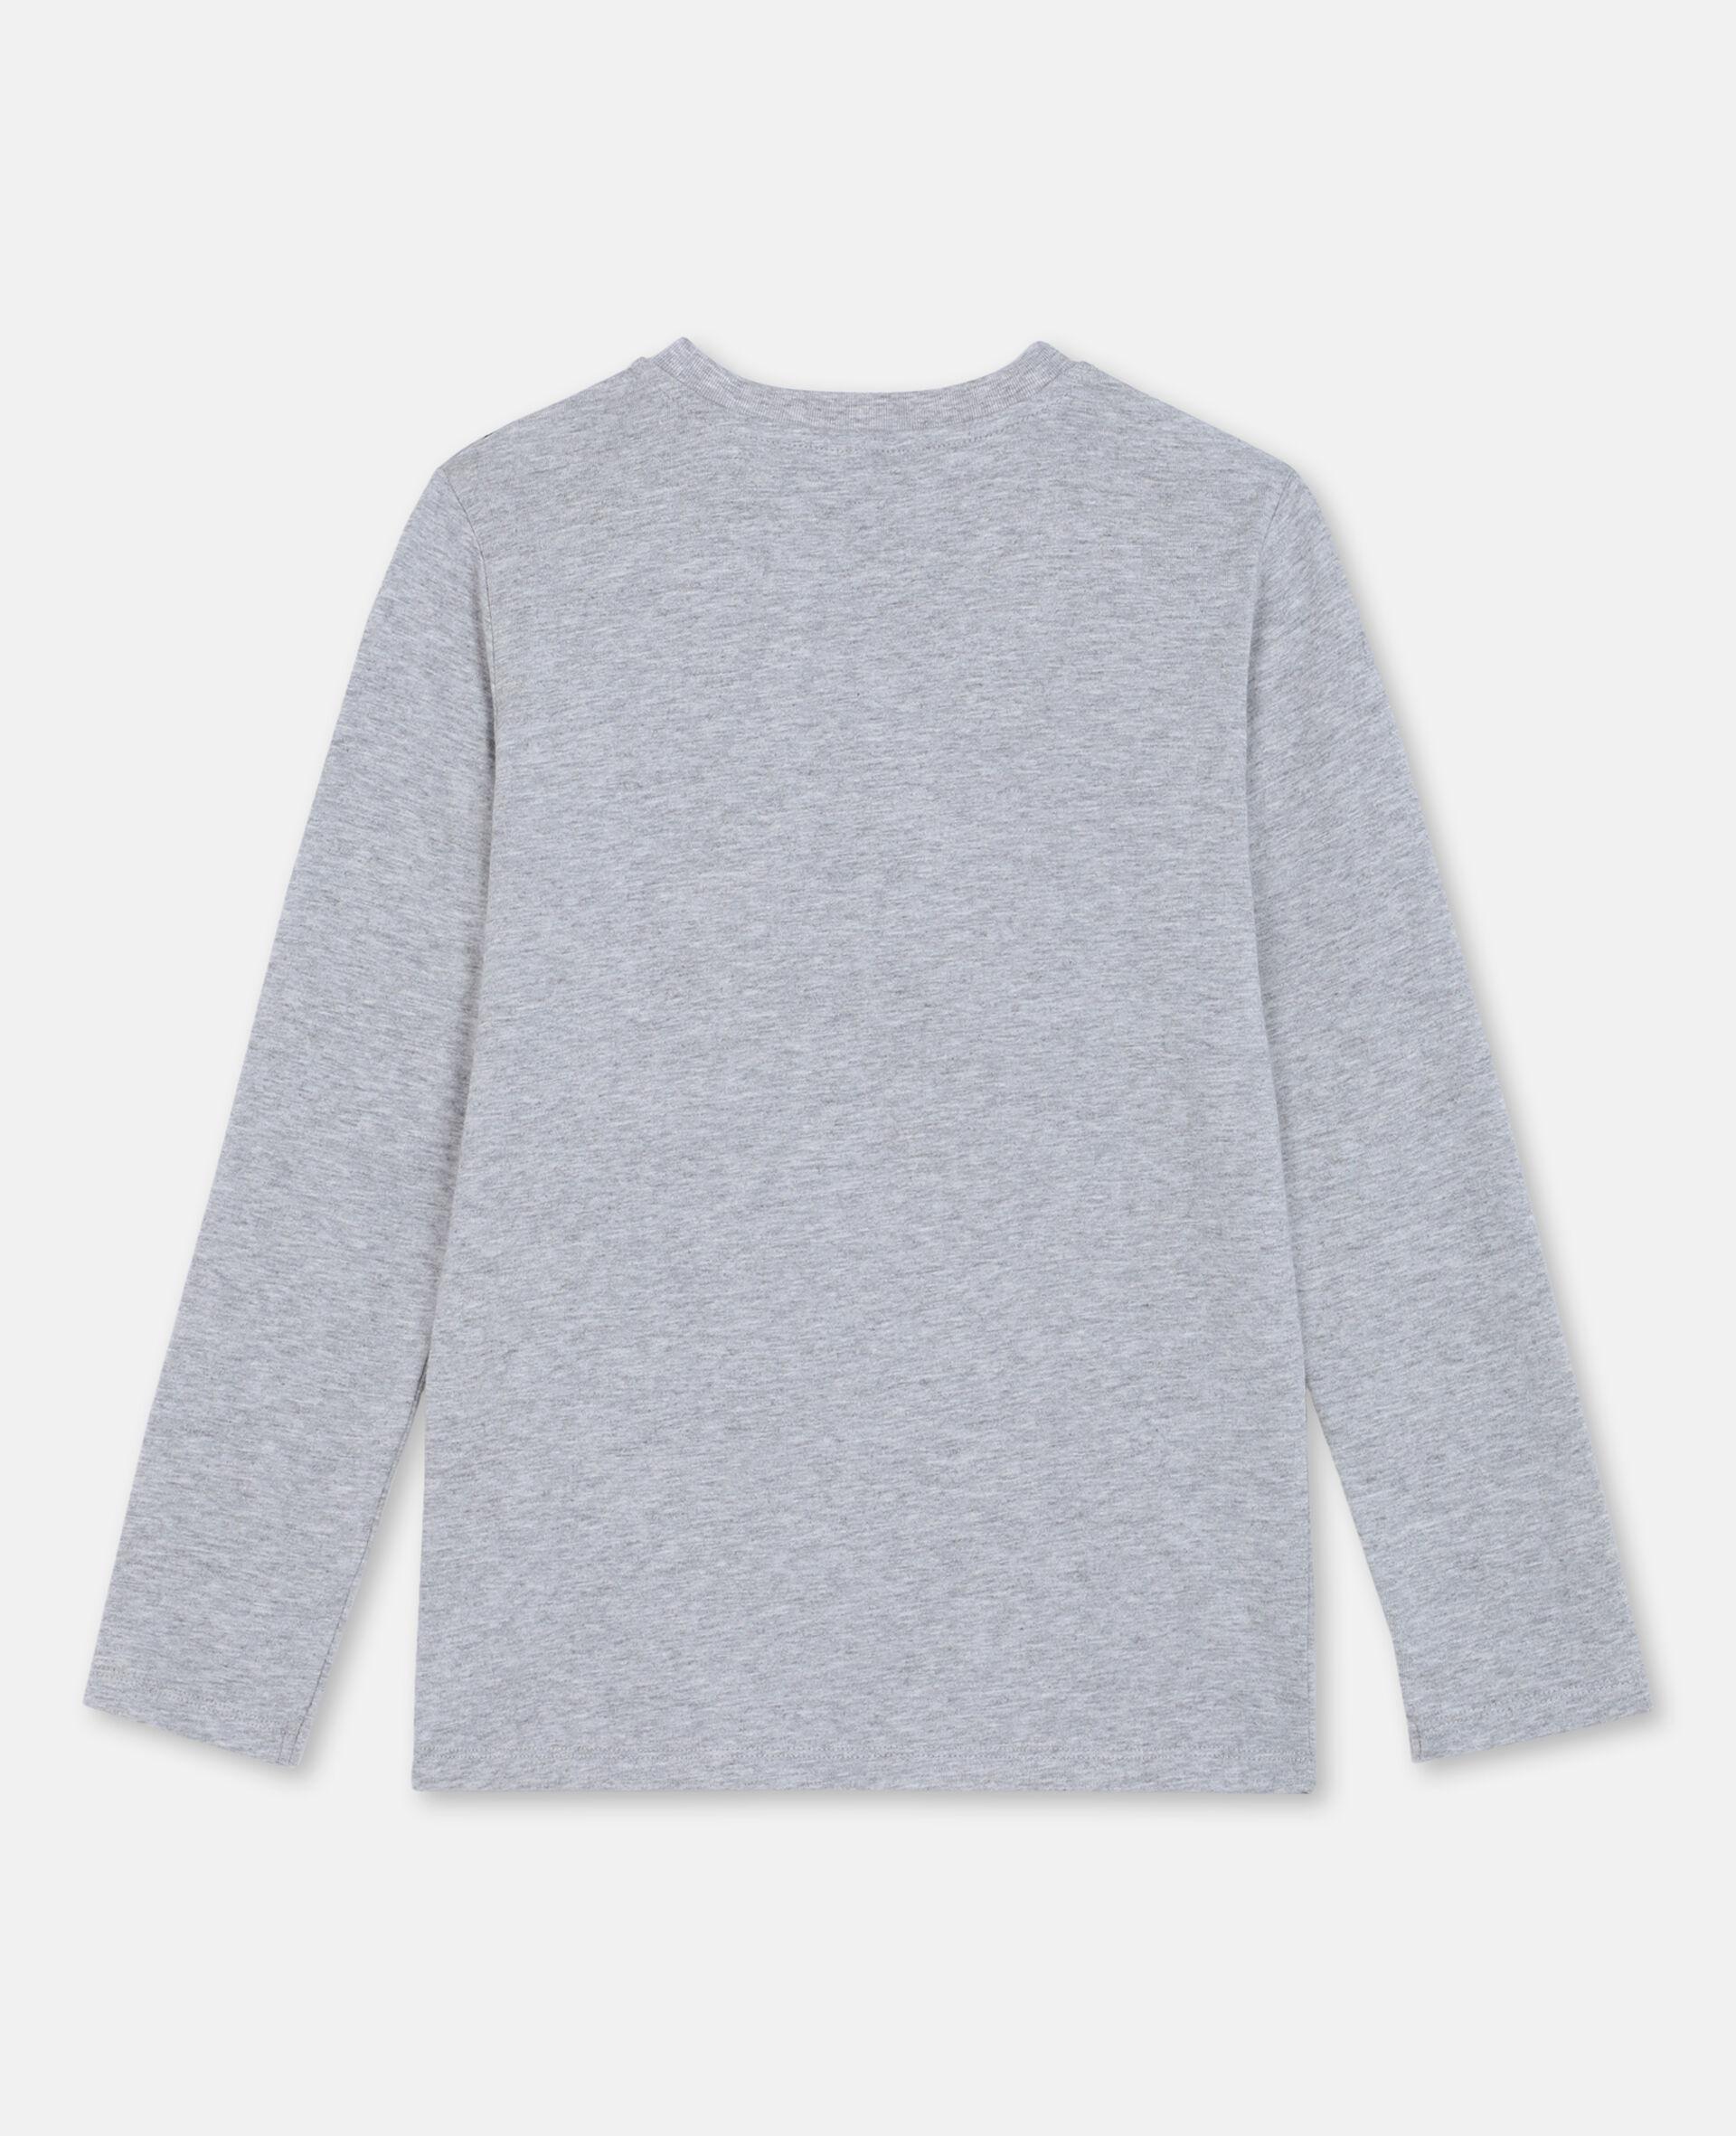 3D Binocular Cotton T-shirt -Grey-large image number 3